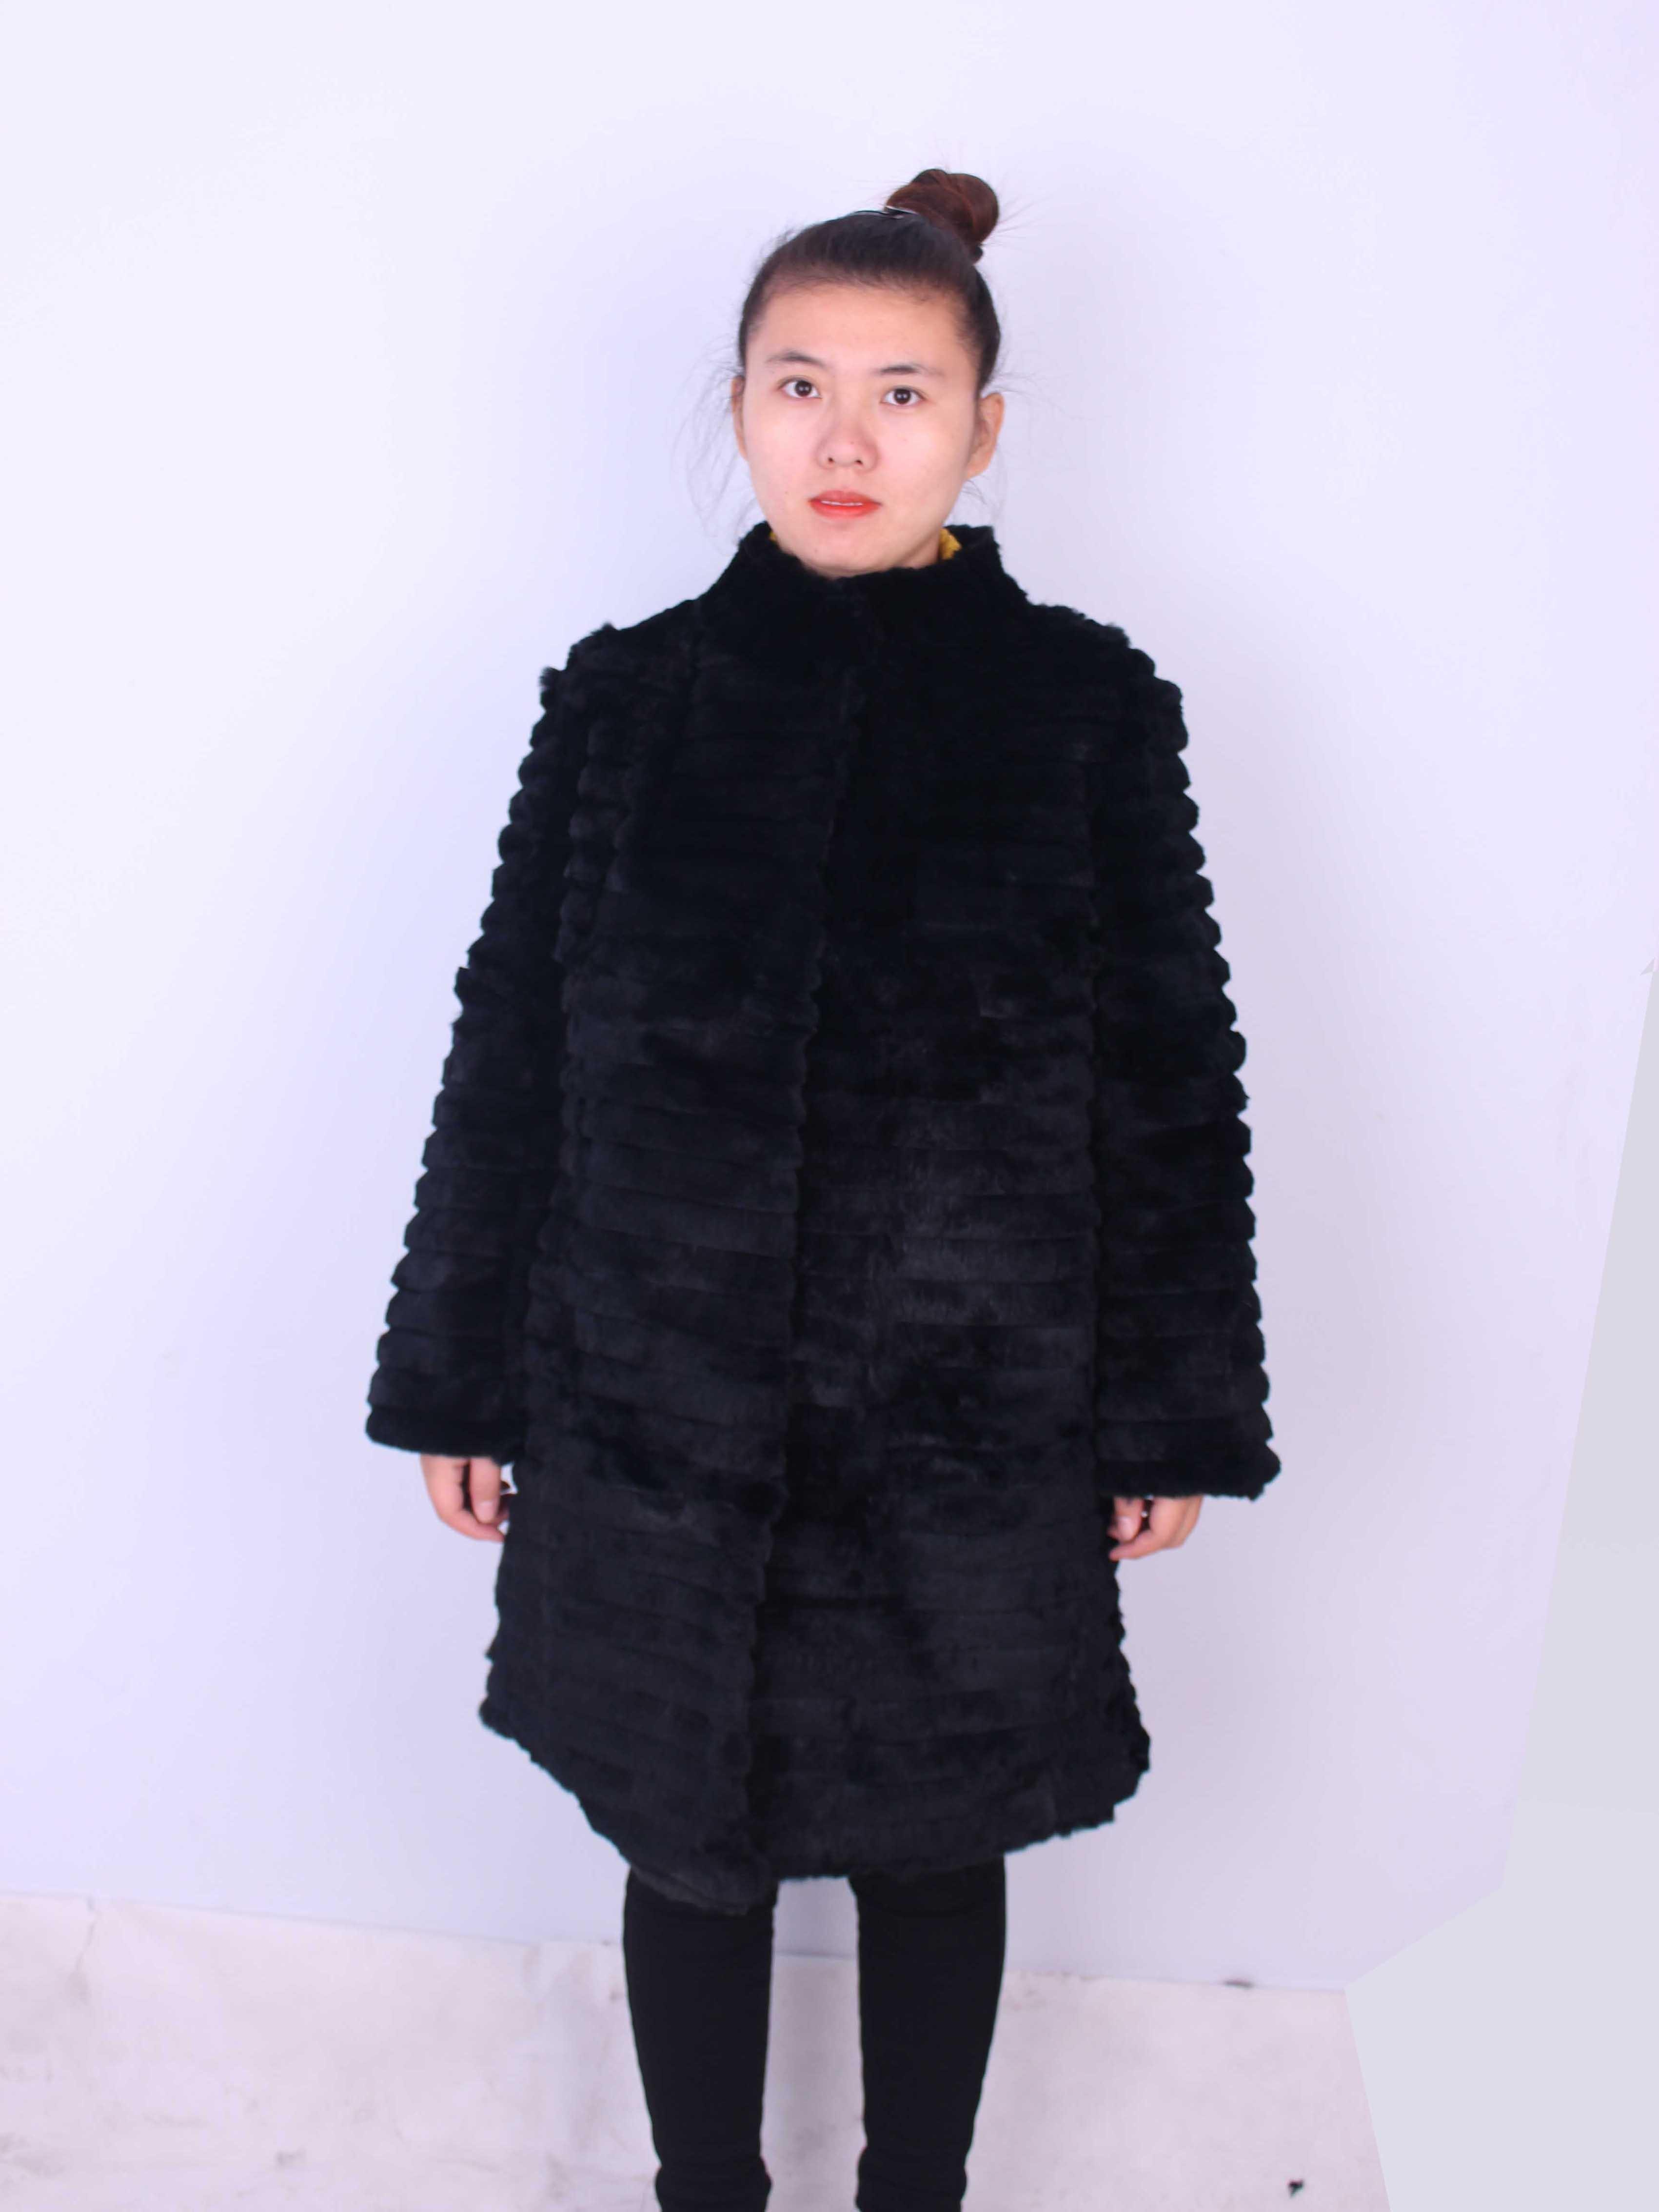 Linhaoshengyue 80cm long rabbit natural  fur coat with 62cm  sleeve length